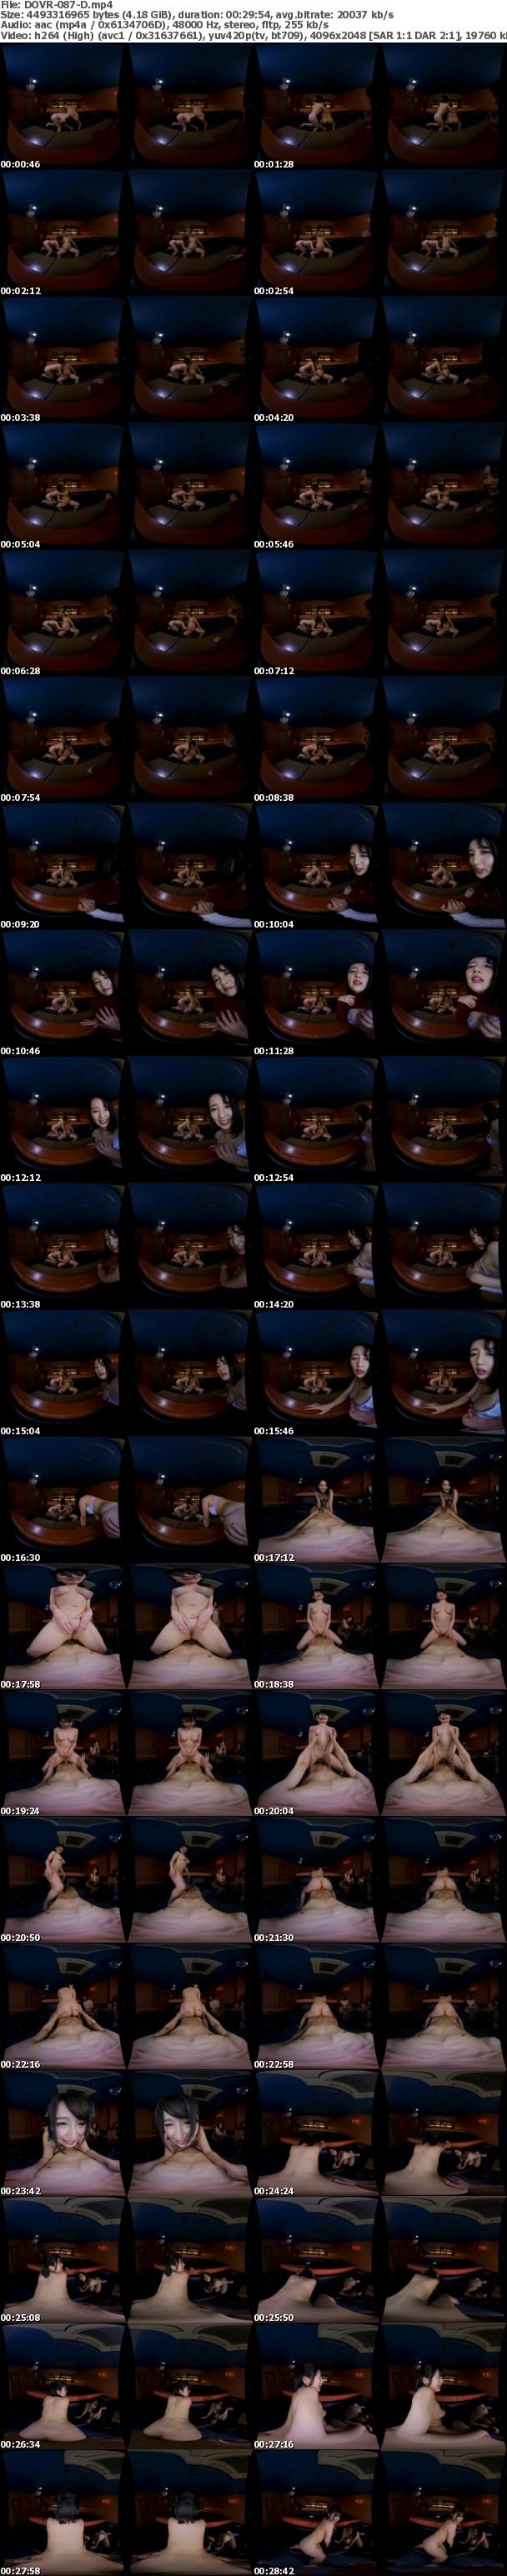 (VR) DOVR-087 【まとめ買い特典あり】あなたは新人AD!女優さんに「ここに挿れてみたい?」と誘われるしメイクさんもオナニーしてるし勃起がとまらな~い撮影現場を一日体験 美咲かんな・優梨まいな